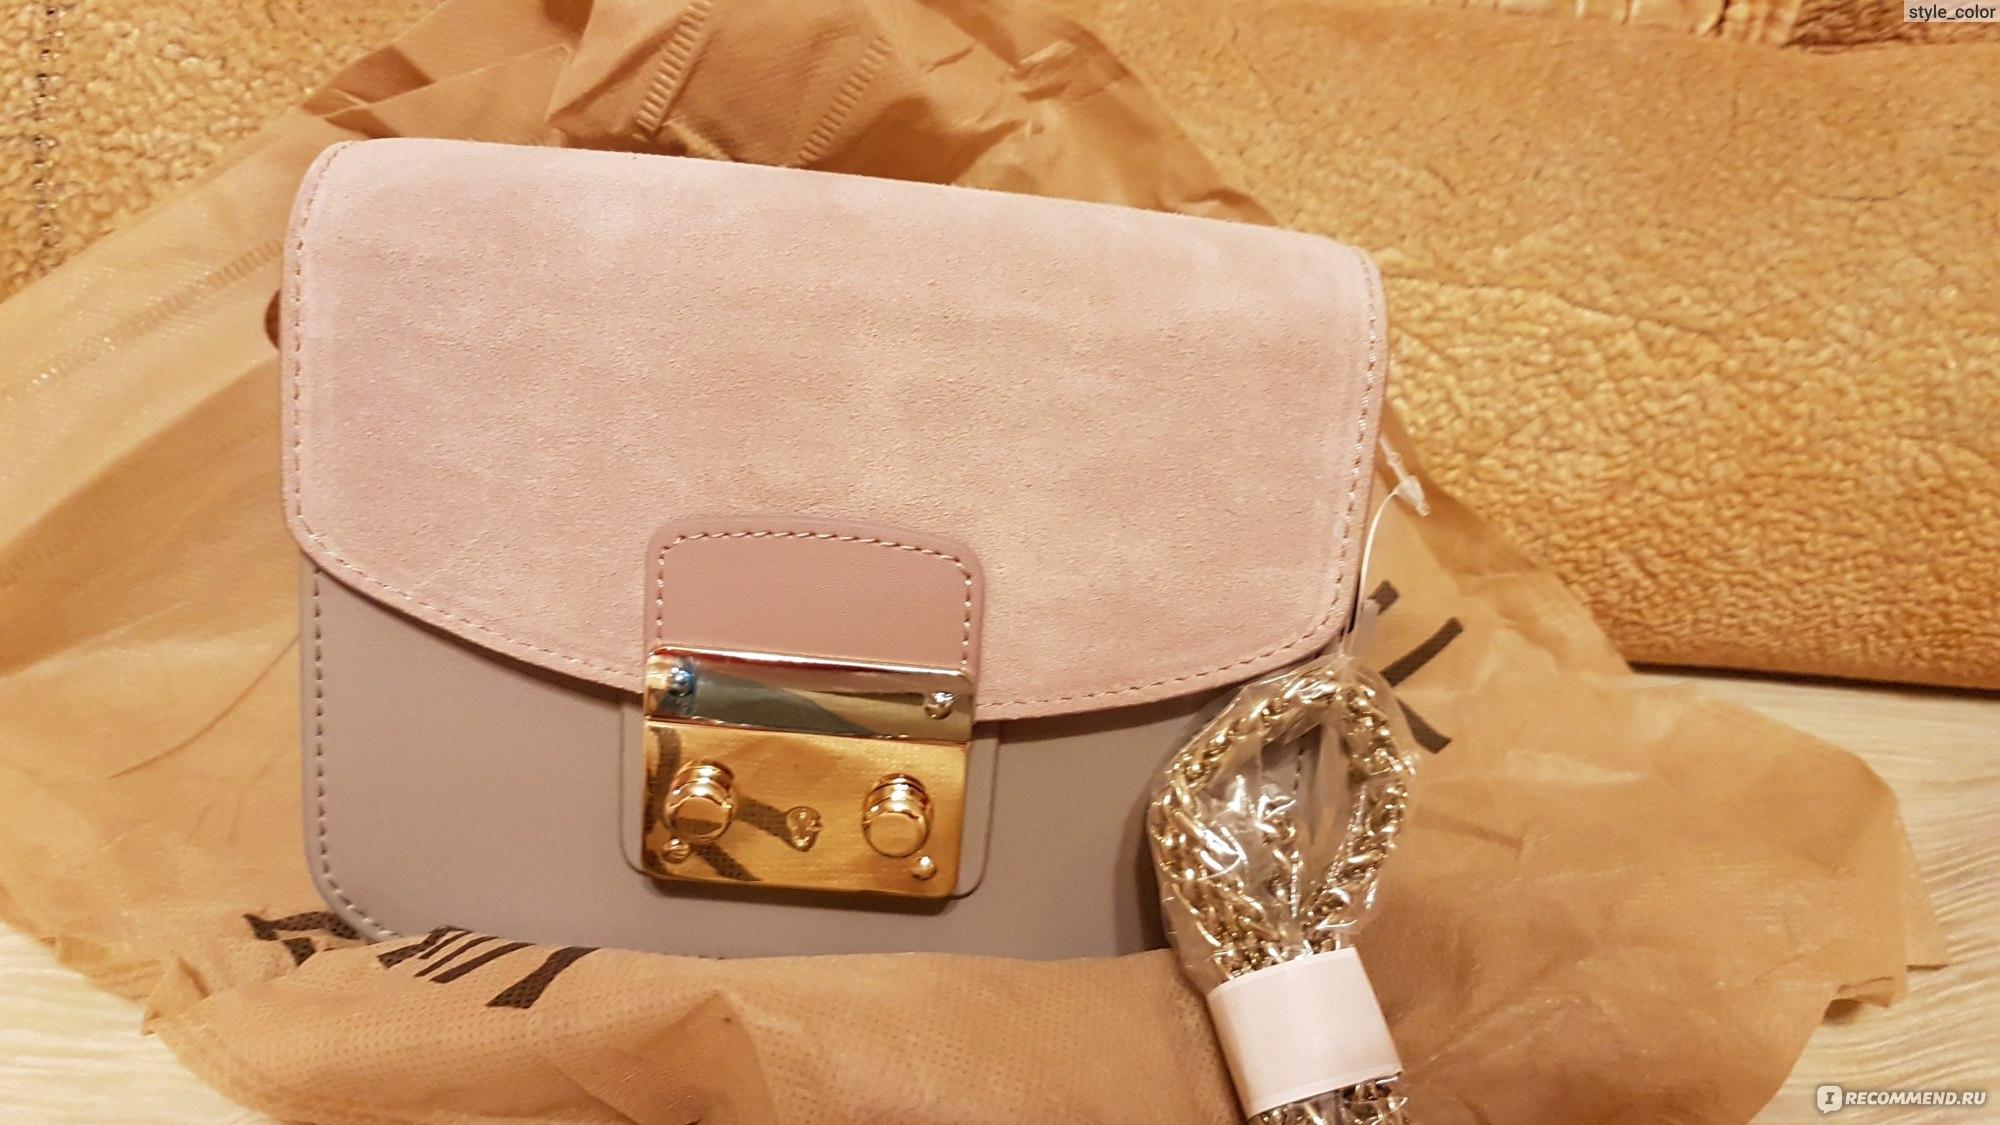 Сумка Женская Aliexpress BISON DENIM belt genuine leather for women luxury  shoulder bags for 2018 bag 072b40fc9fd